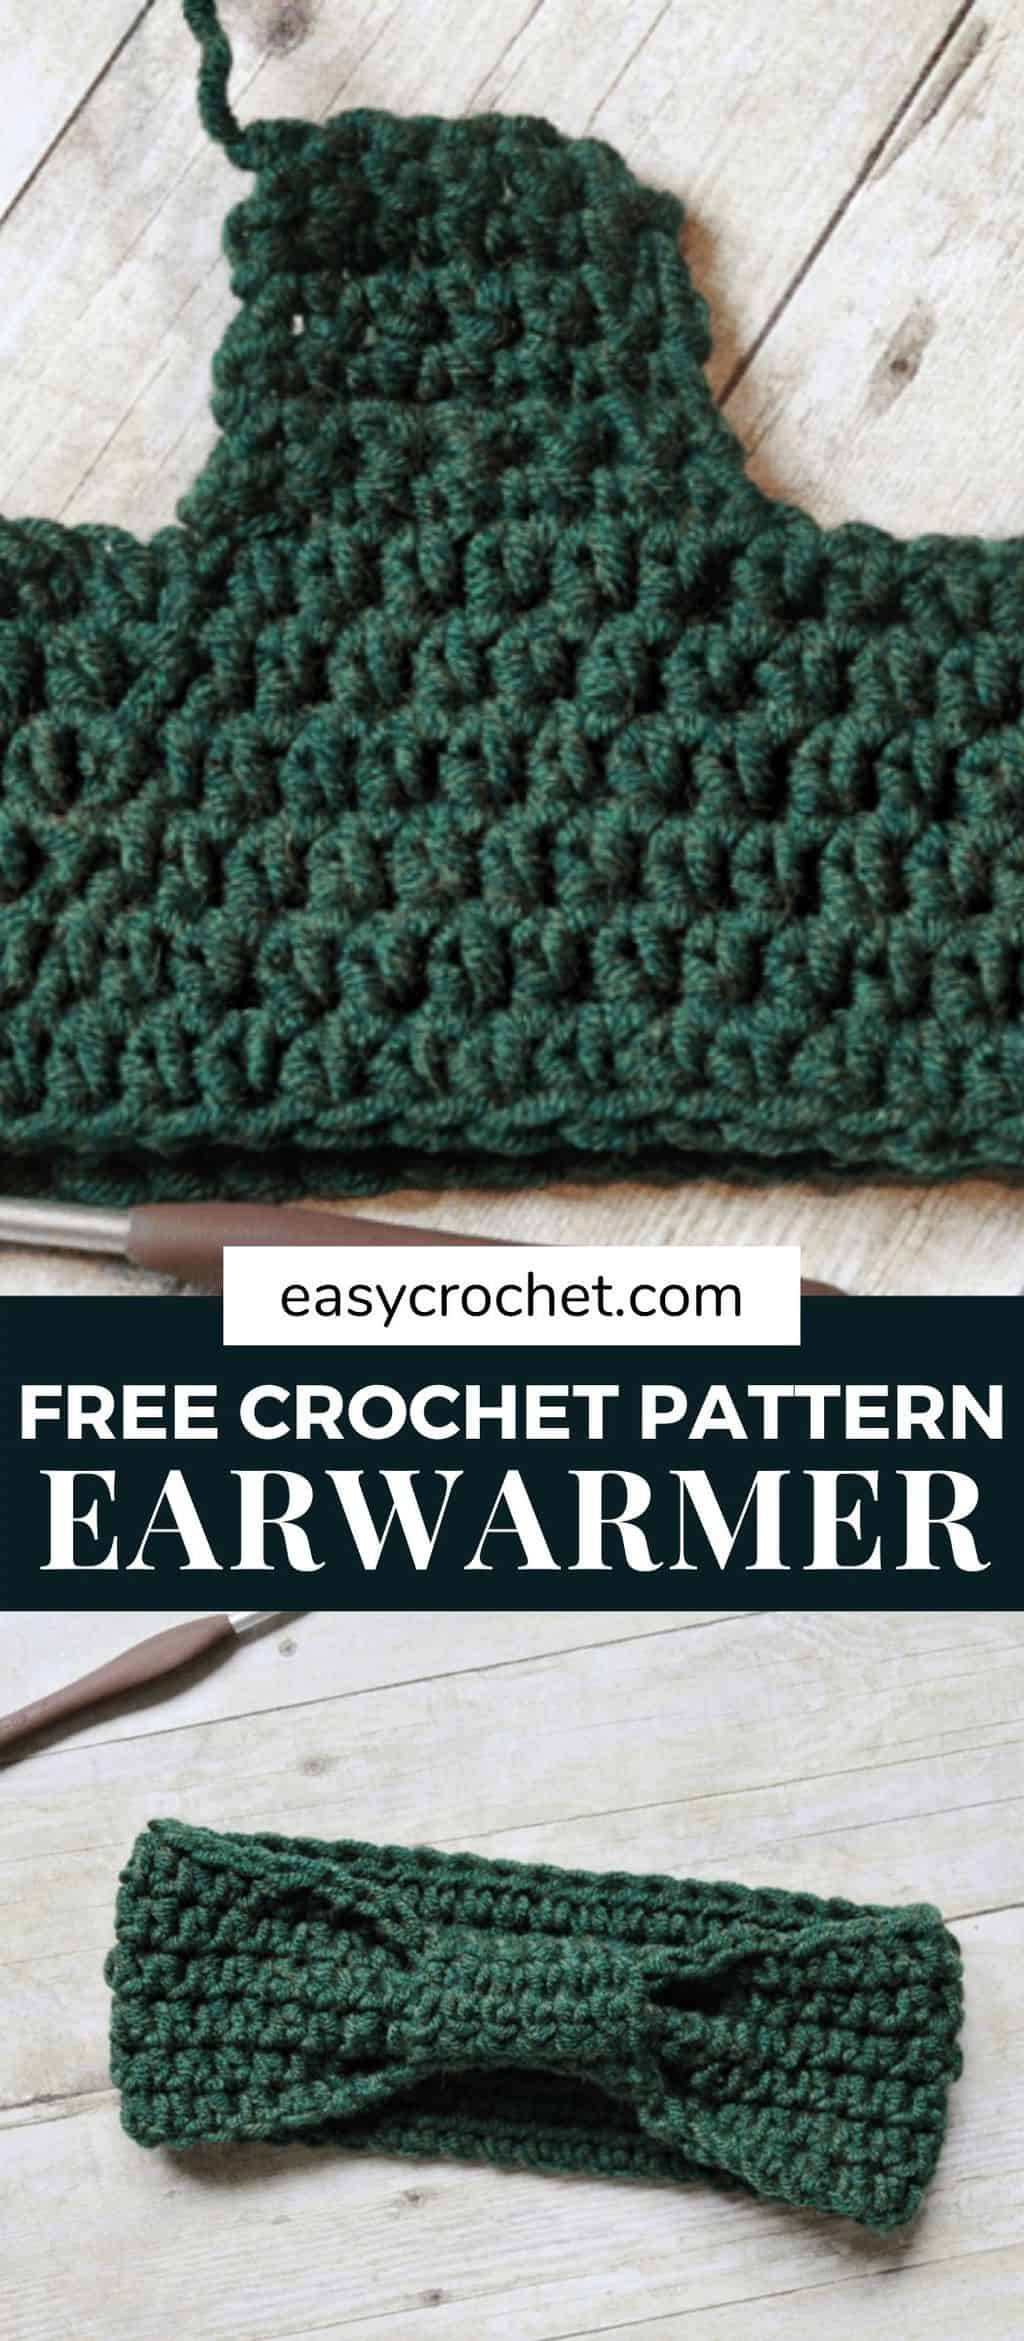 Wrapped Headband Crochet Pattern from Easy Crochet - Free Crochet Headband Pattern via @easycrochetcom